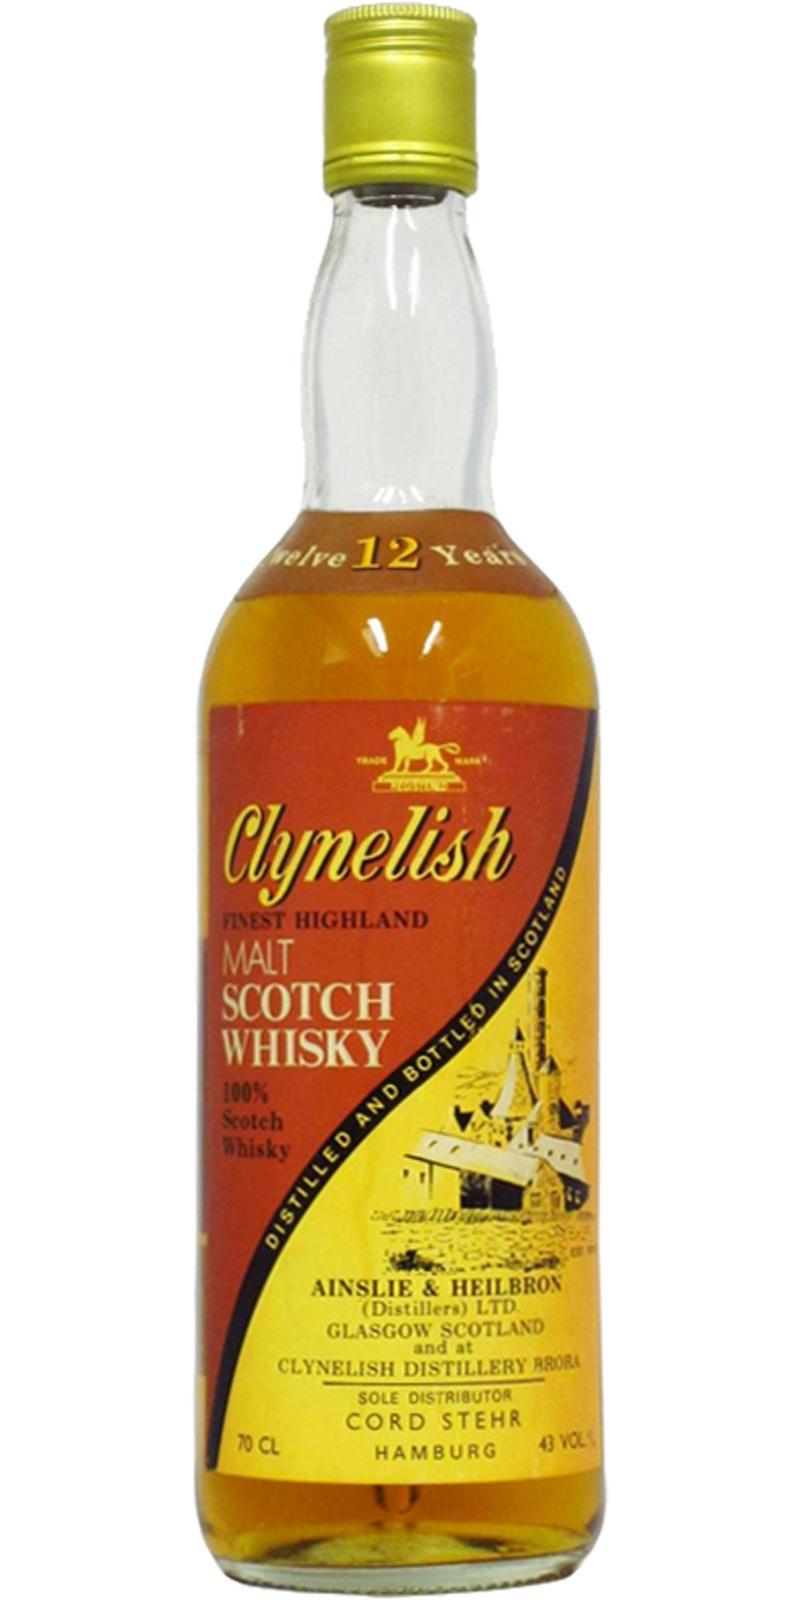 Clynelish 12-year-old